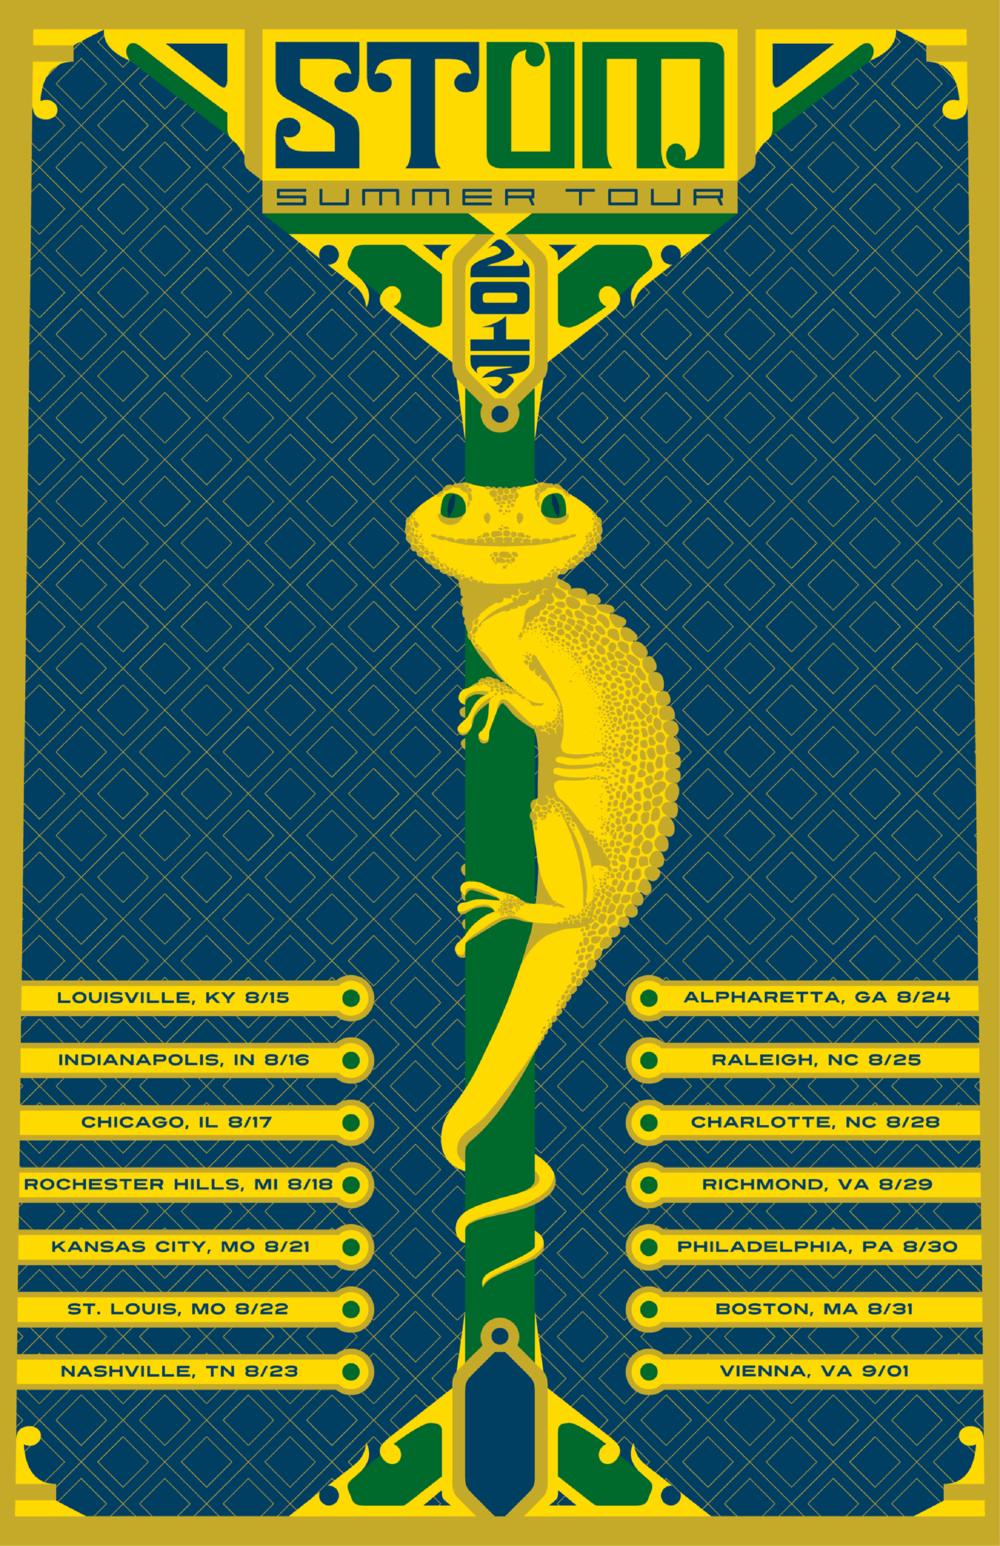 Poster & Album Art-11.png